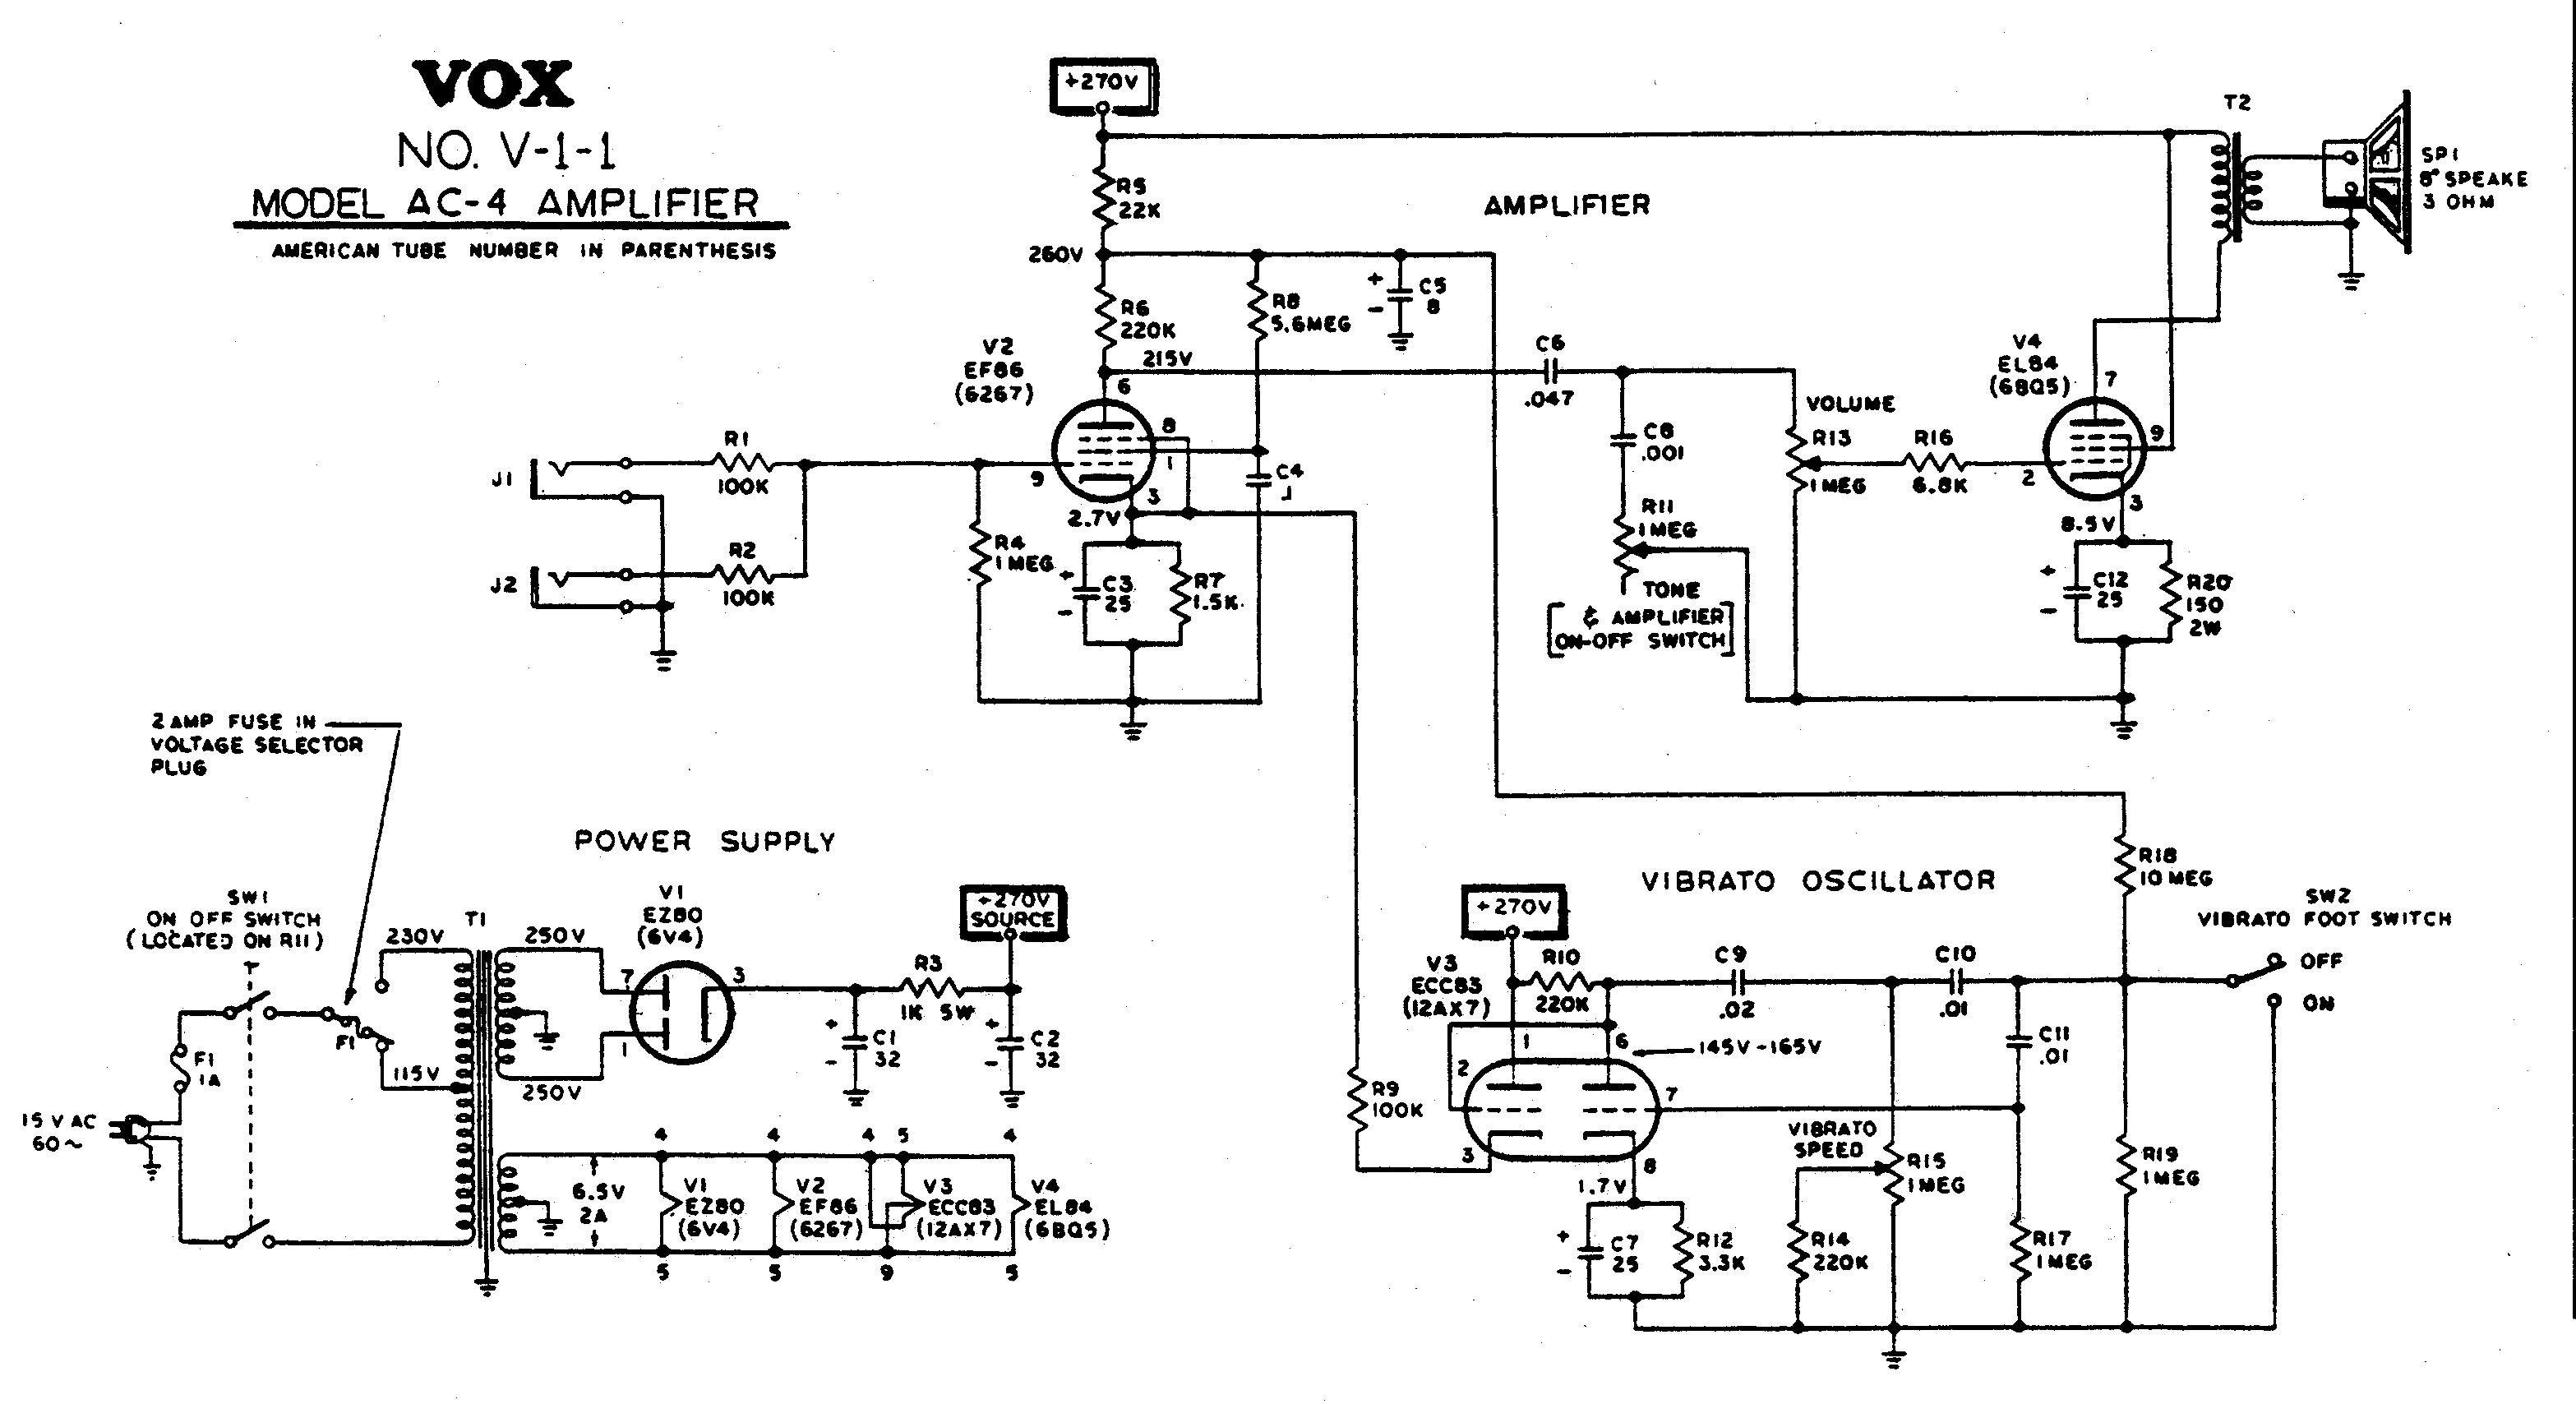 VW_8731] Vox Amp Schematic Free Diagram | Vox Pickup Wiring Diagrams |  | Onom Tron Marki Tacle Aeocy Tran Boapu Mohammedshrine Librar Wiring 101